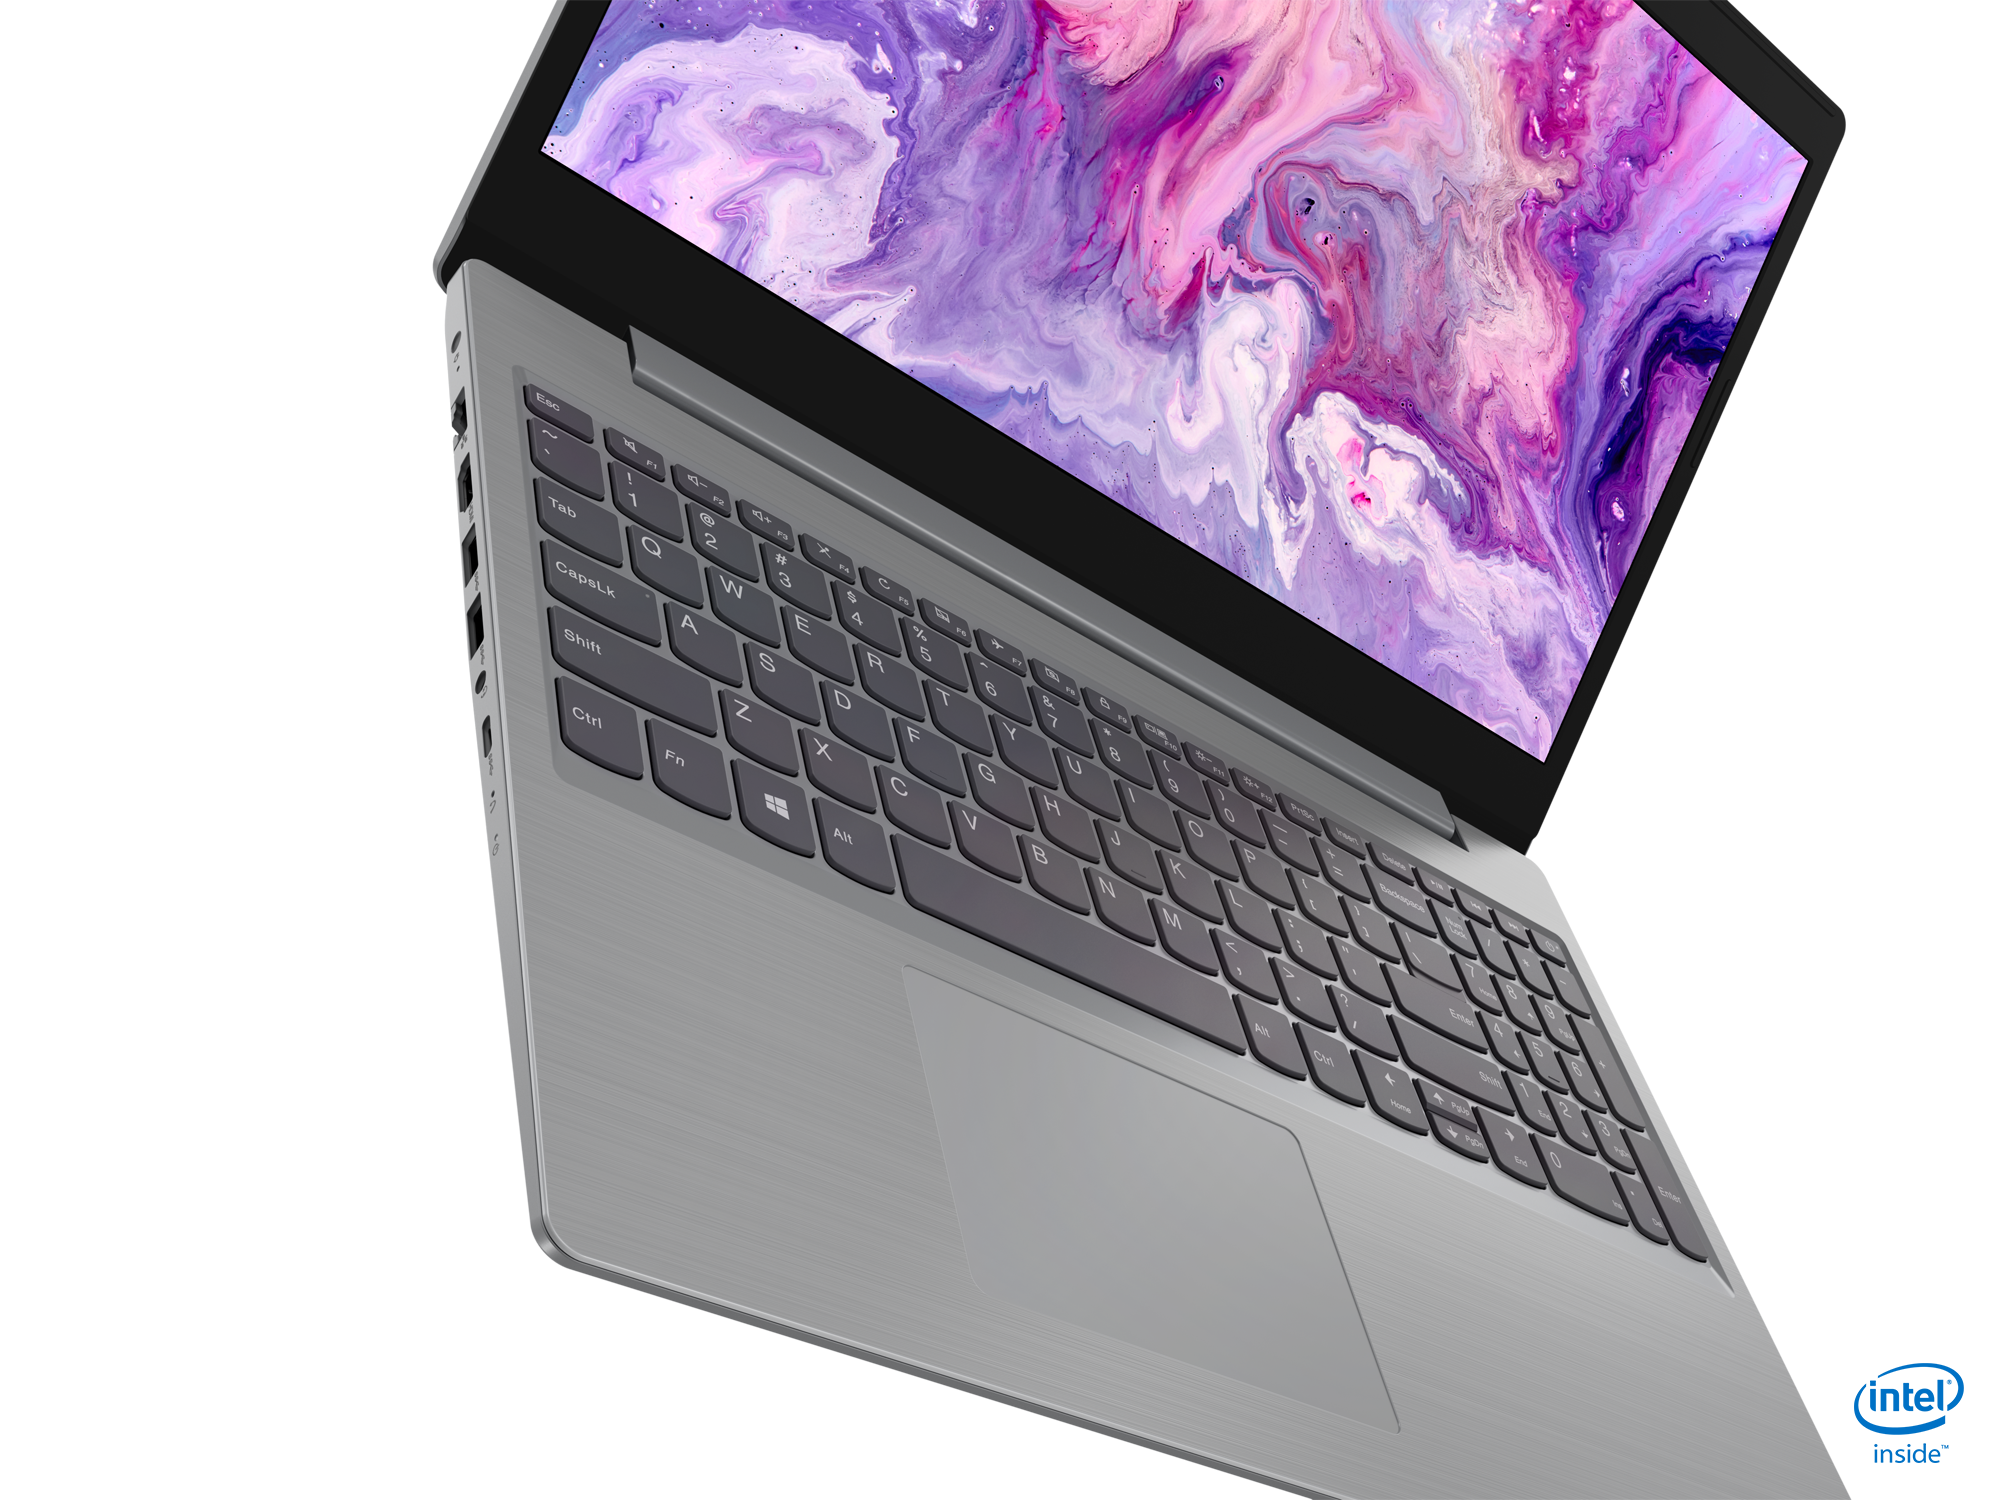 Lenovo IdeaPad L3 15IML05 Intel Core i5 10210U 8GB 512GB SSD Freedos 15.6 inç HD 81Y300GTTXT3